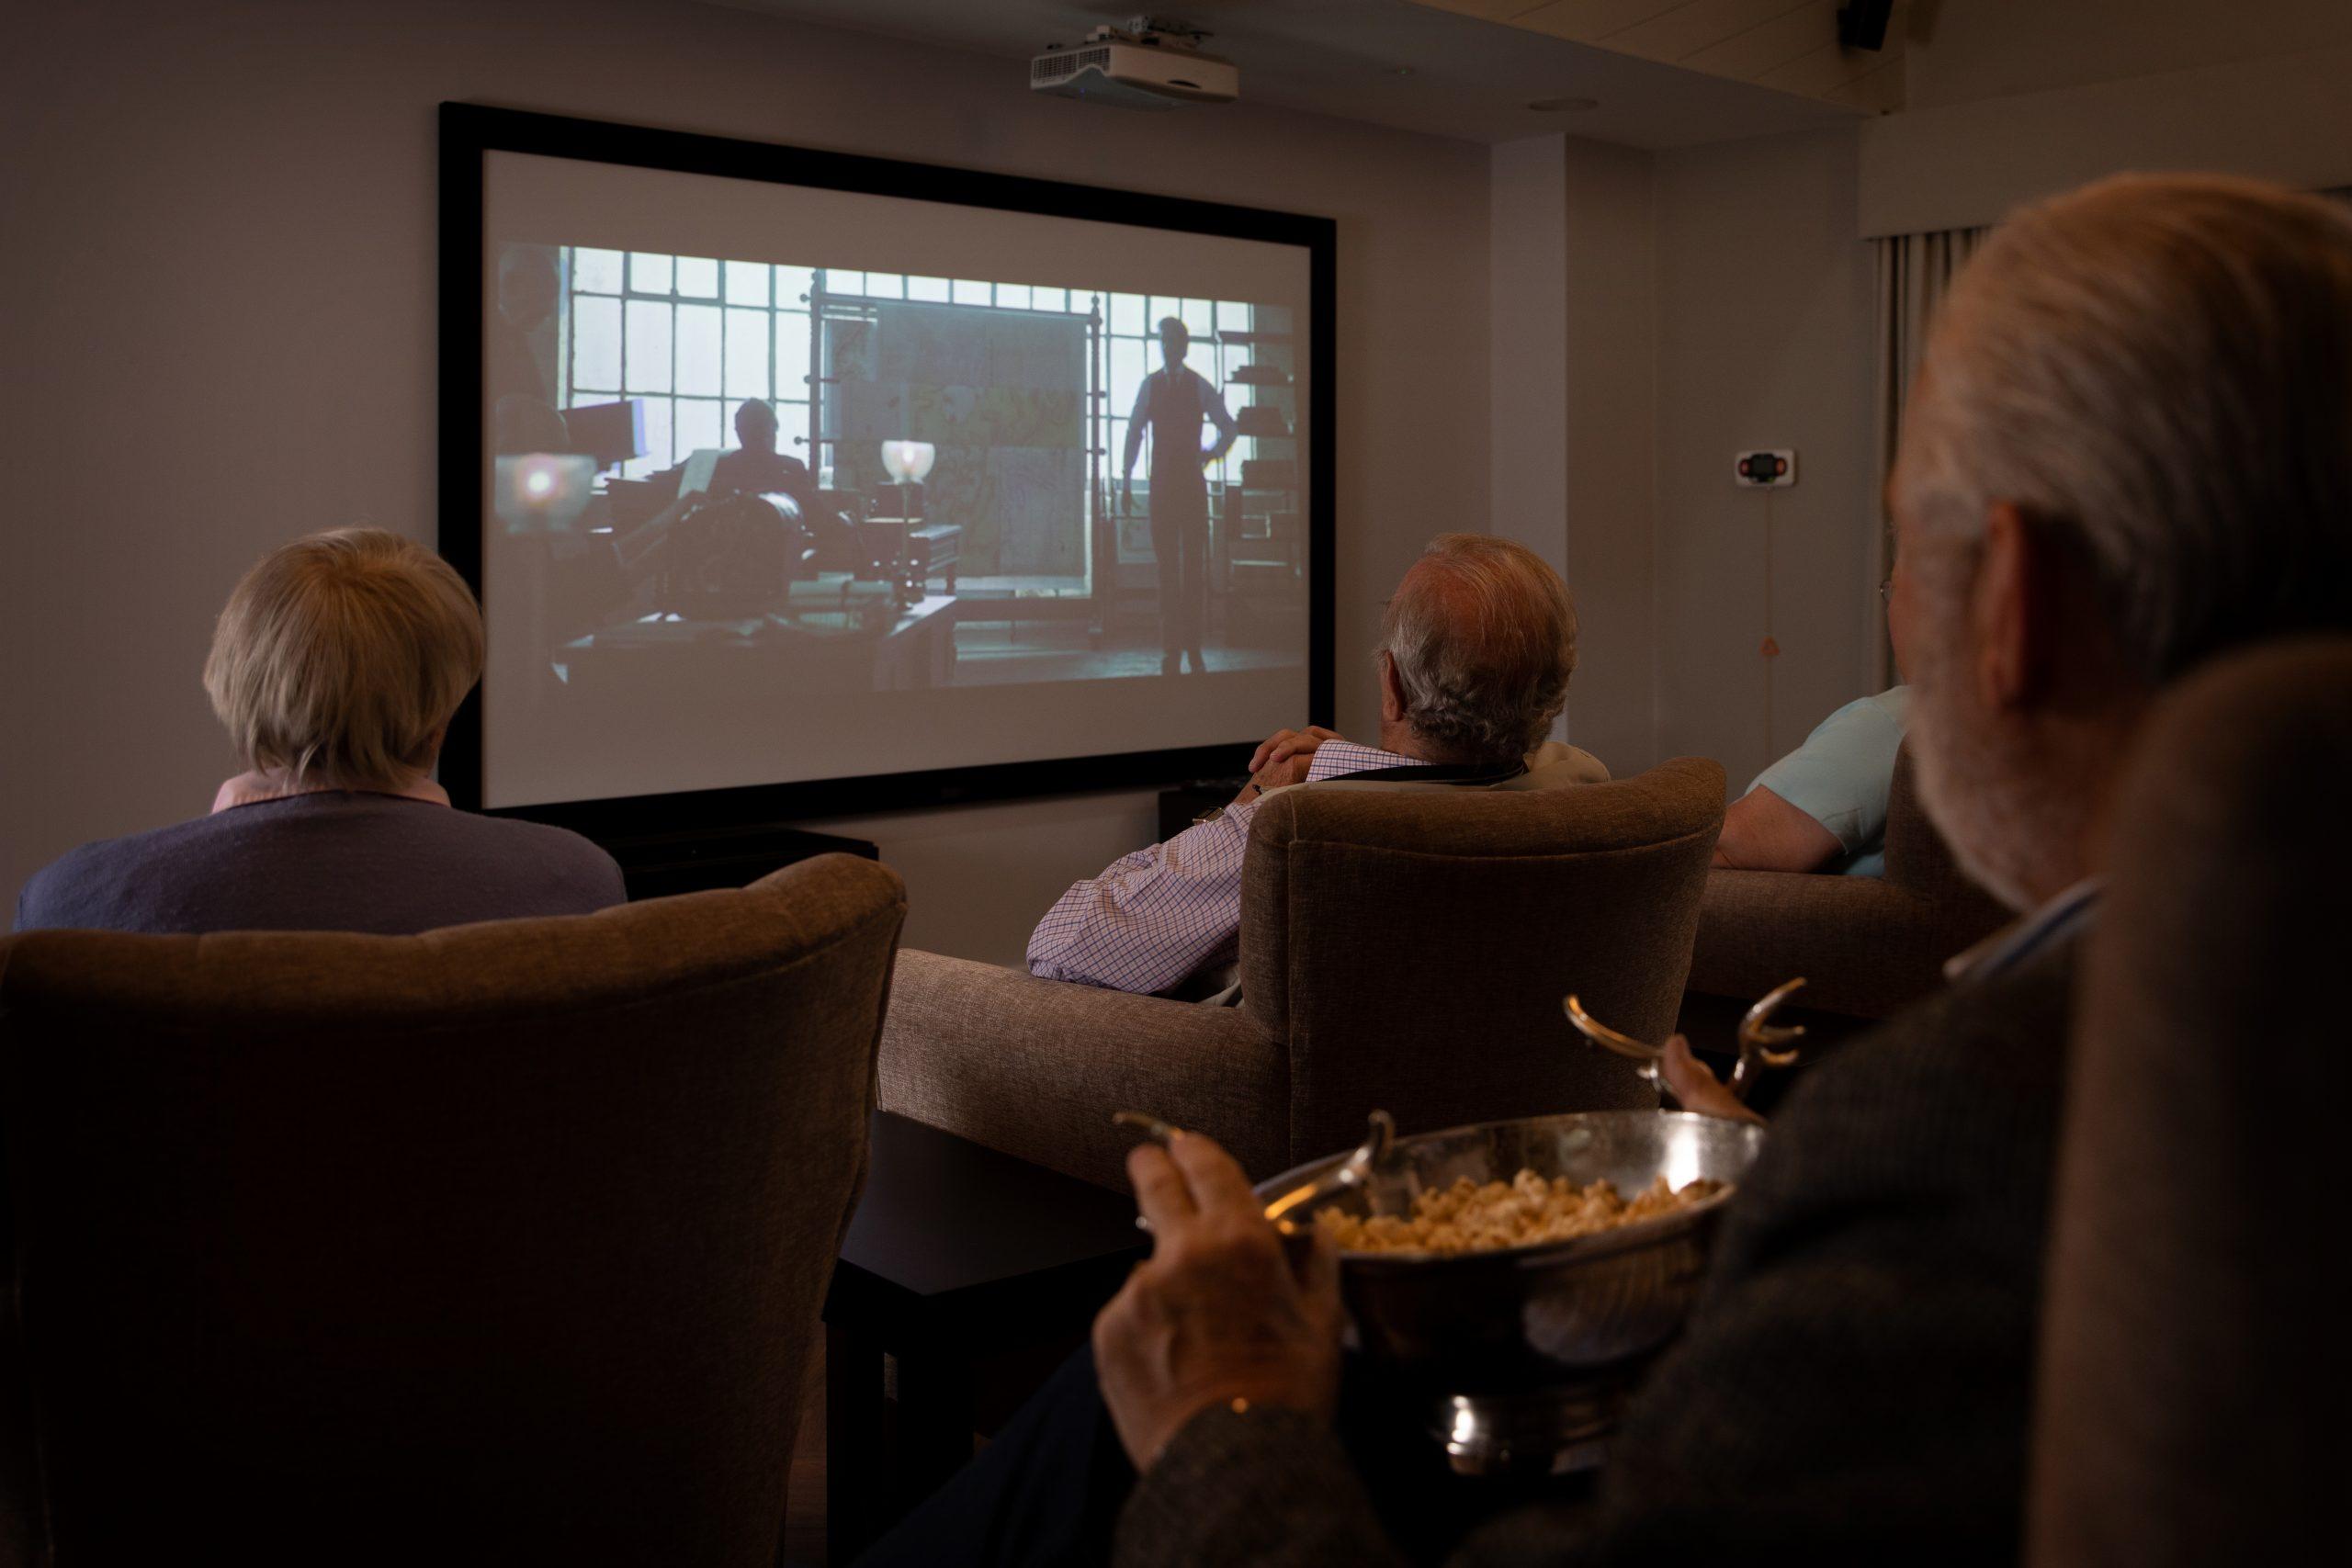 Residents in Cinema room